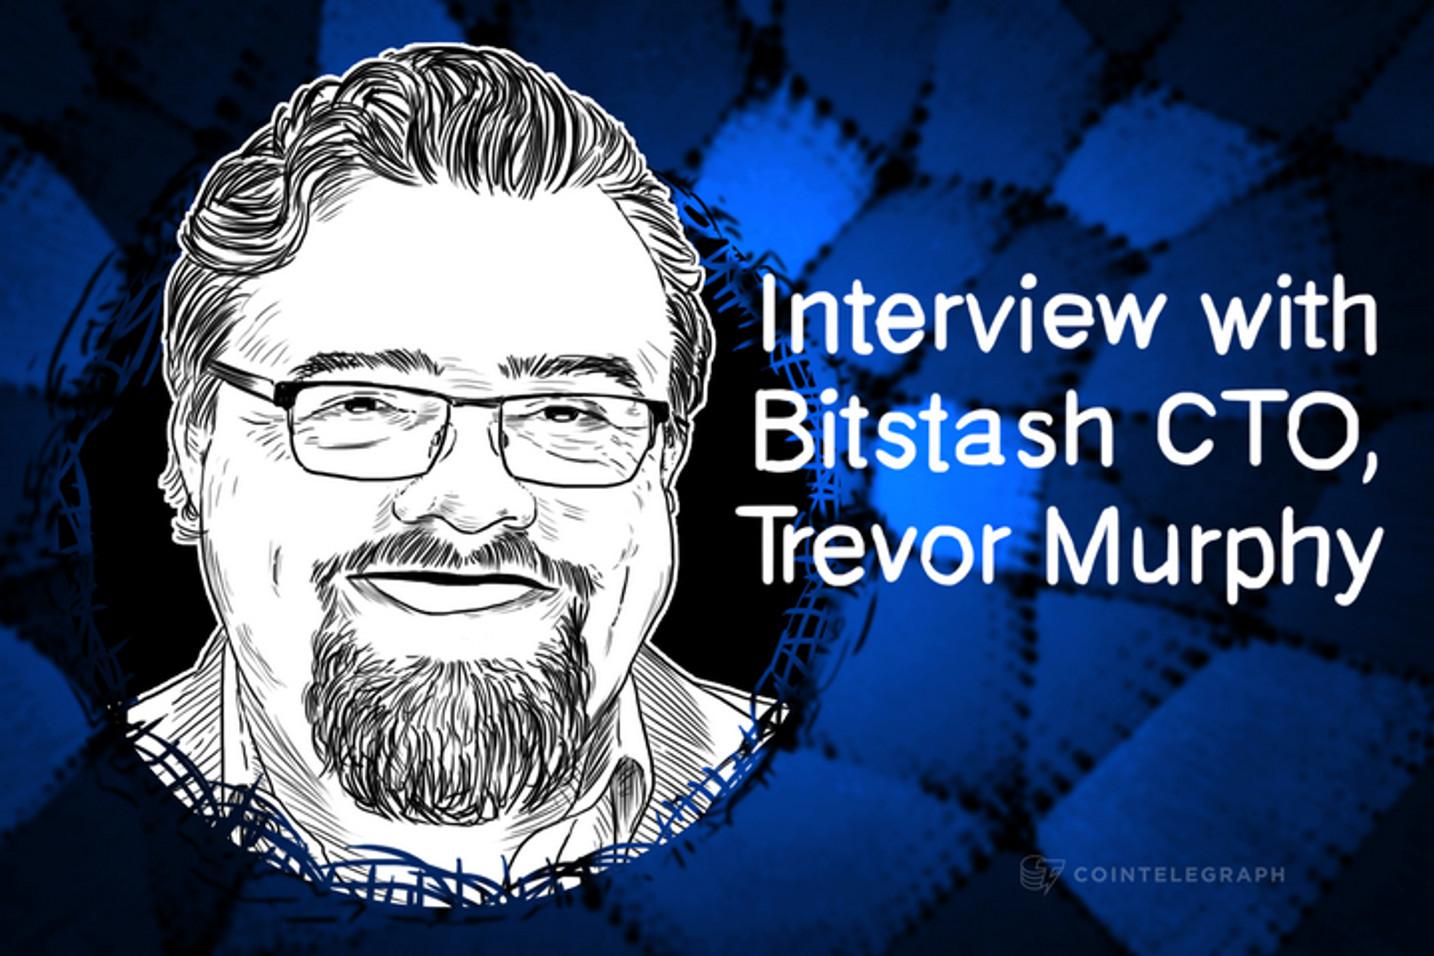 An Inside Look at Bitstash's New 3-Tier Hardware Wallet: Interview with CTO, Trevor Murphy